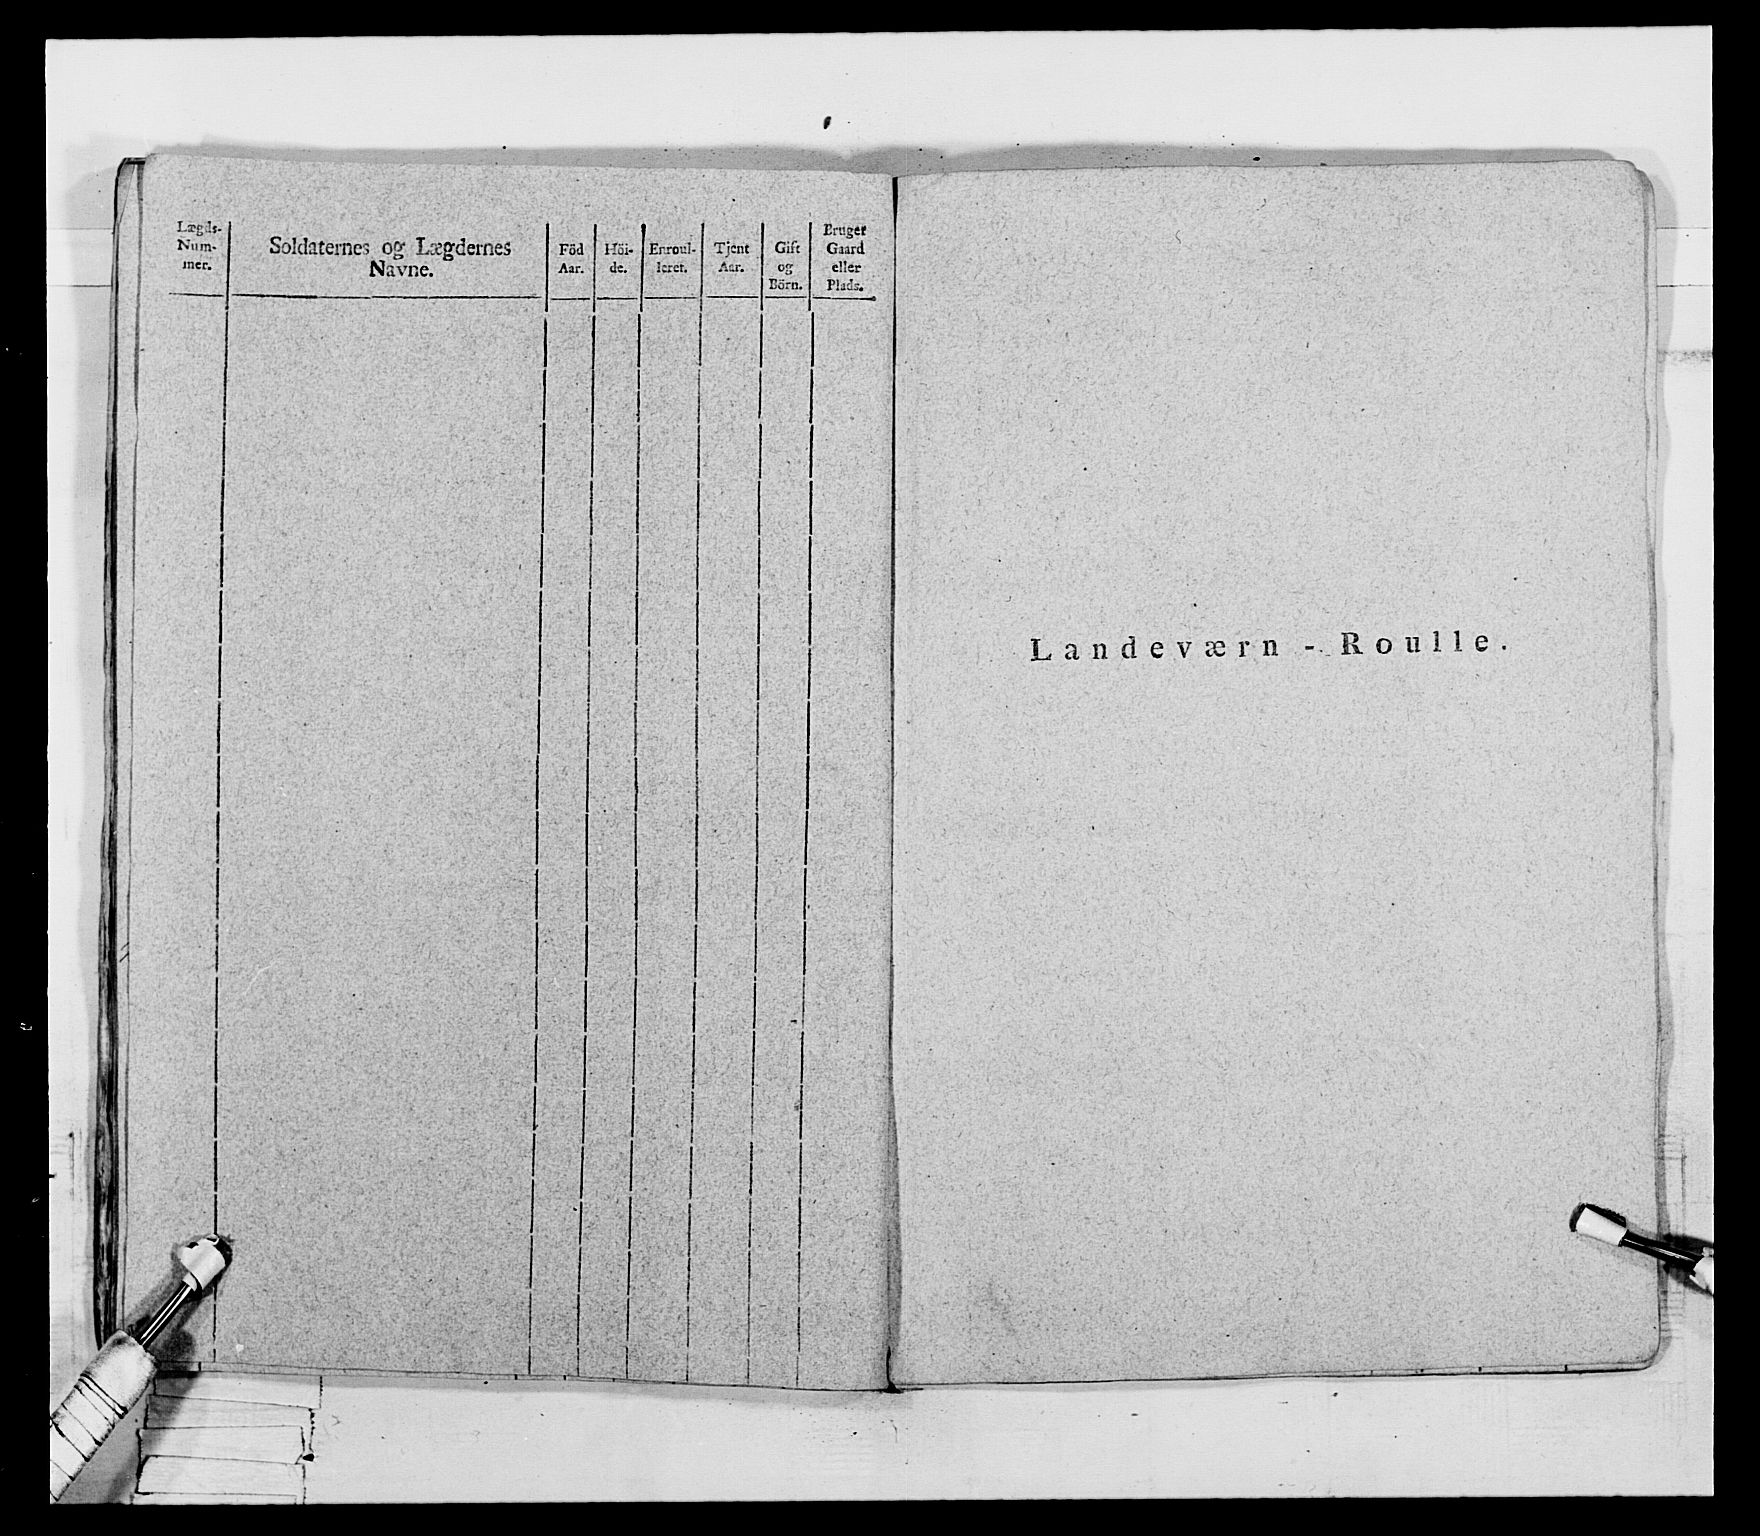 RA, Generalitets- og kommissariatskollegiet, Det kongelige norske kommissariatskollegium, E/Eh/L0069: Opplandske gevorbne infanteriregiment, 1810-1818, s. 241